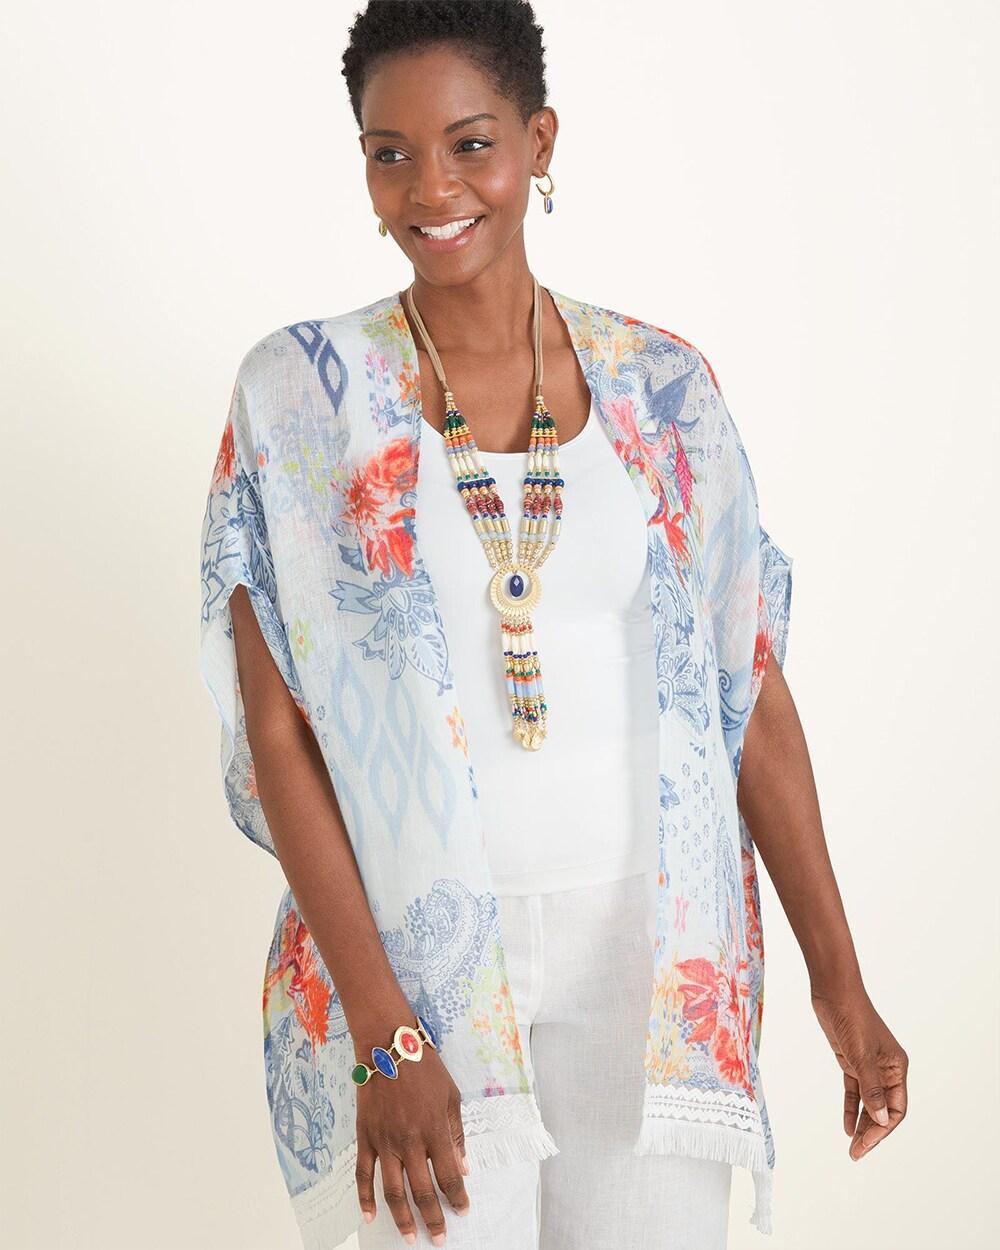 1e2d43fb13 Chico s - Shop Women s Clothing   Accessories Online - Chico s